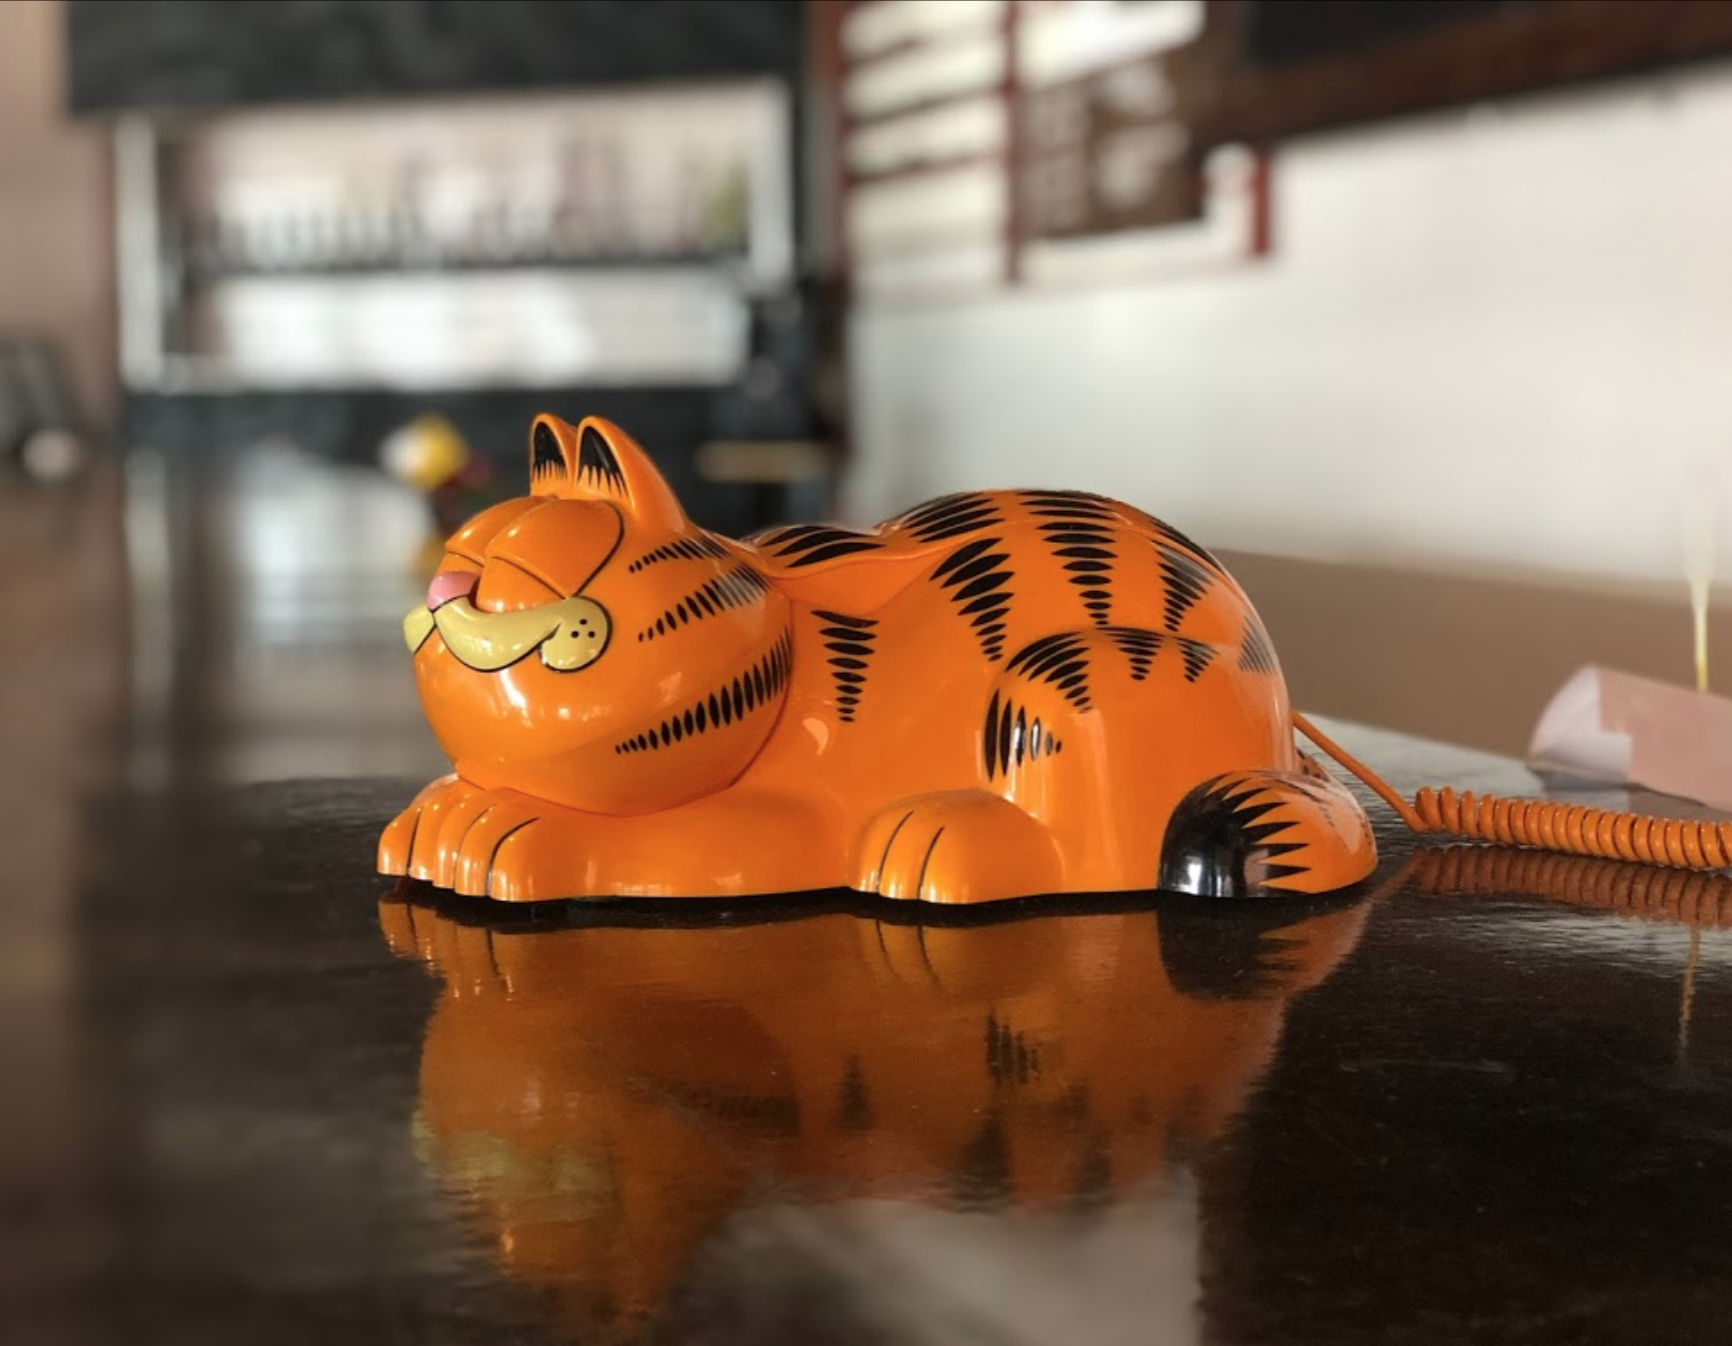 Garfield the Nostalgia Brewery Cat